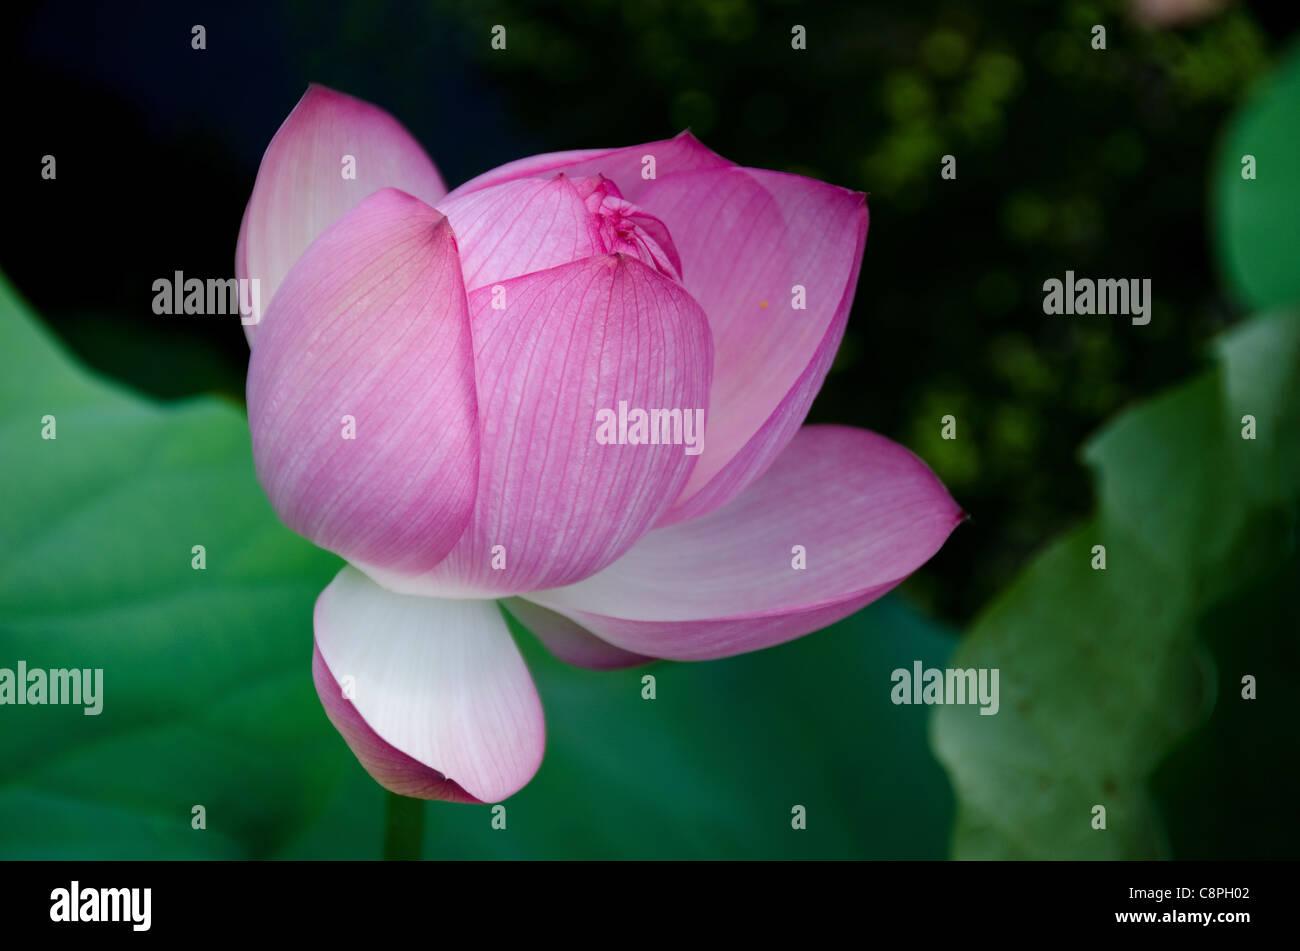 Closed lotus flower stock photos closed lotus flower stock images detail of a beautiful pink lotus flower with closed petals nelumbo nucifera stock image izmirmasajfo